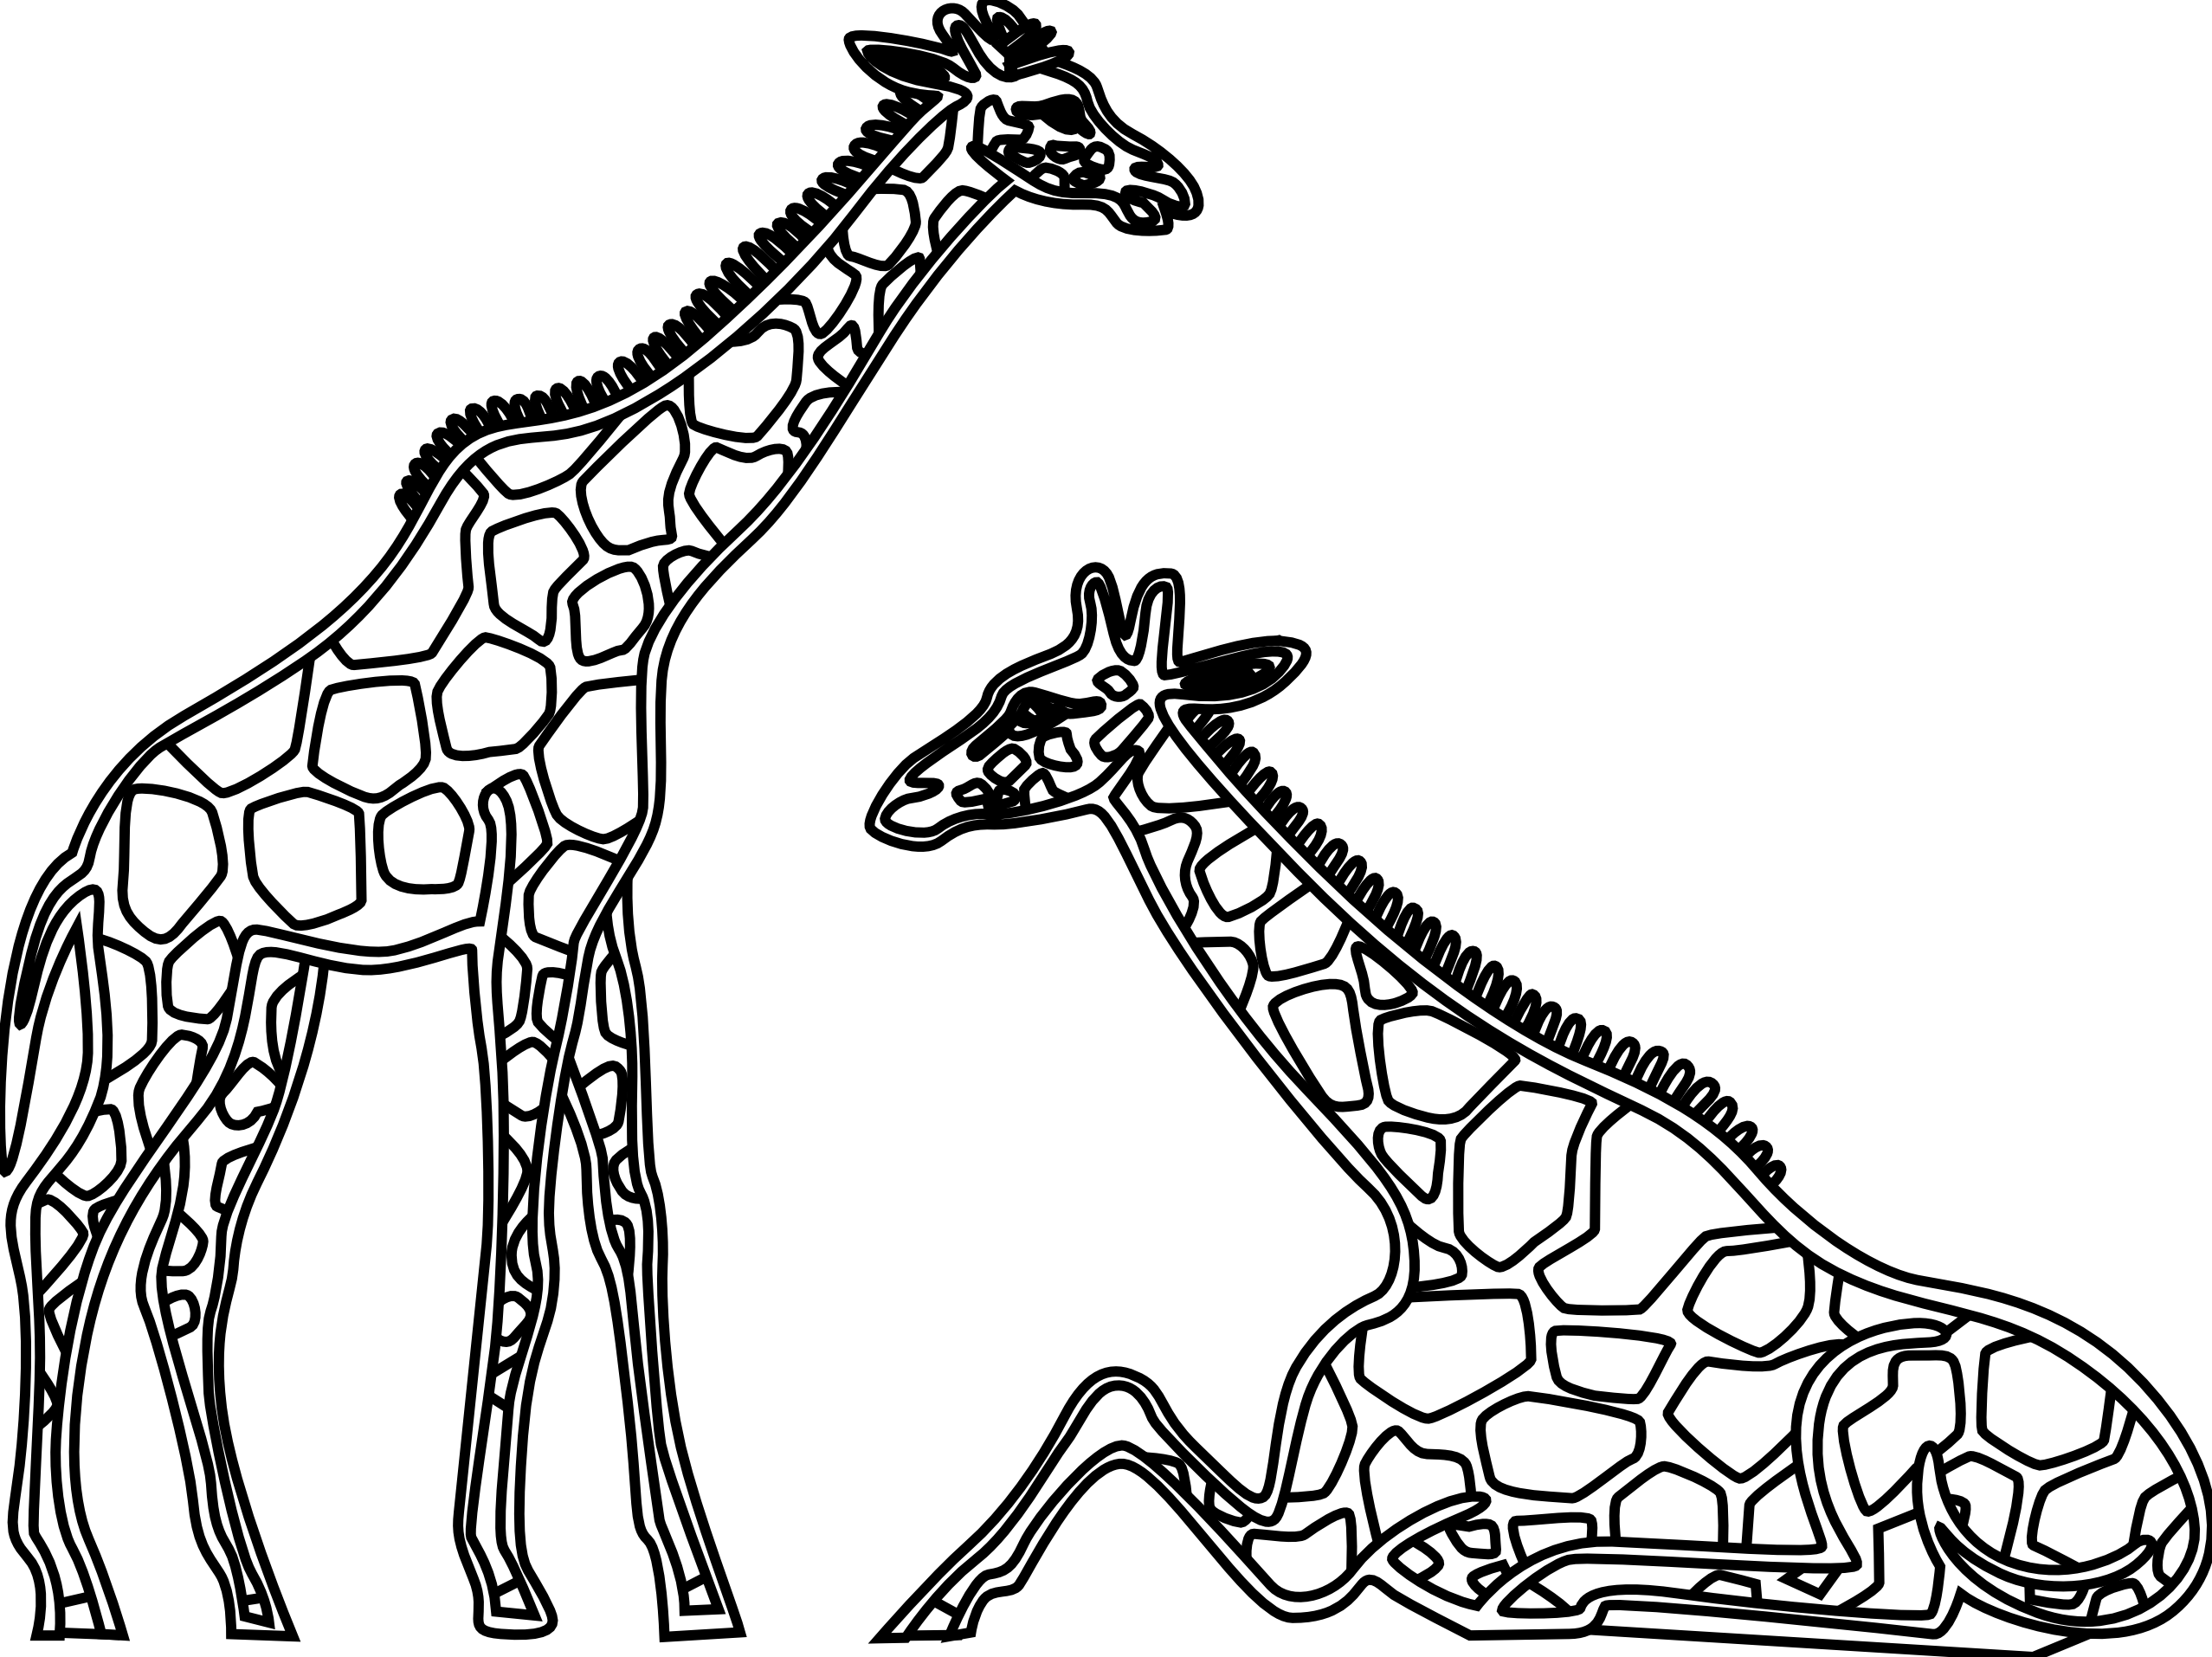 Zipper clipart transparent Black Giraffe And Giraffe White